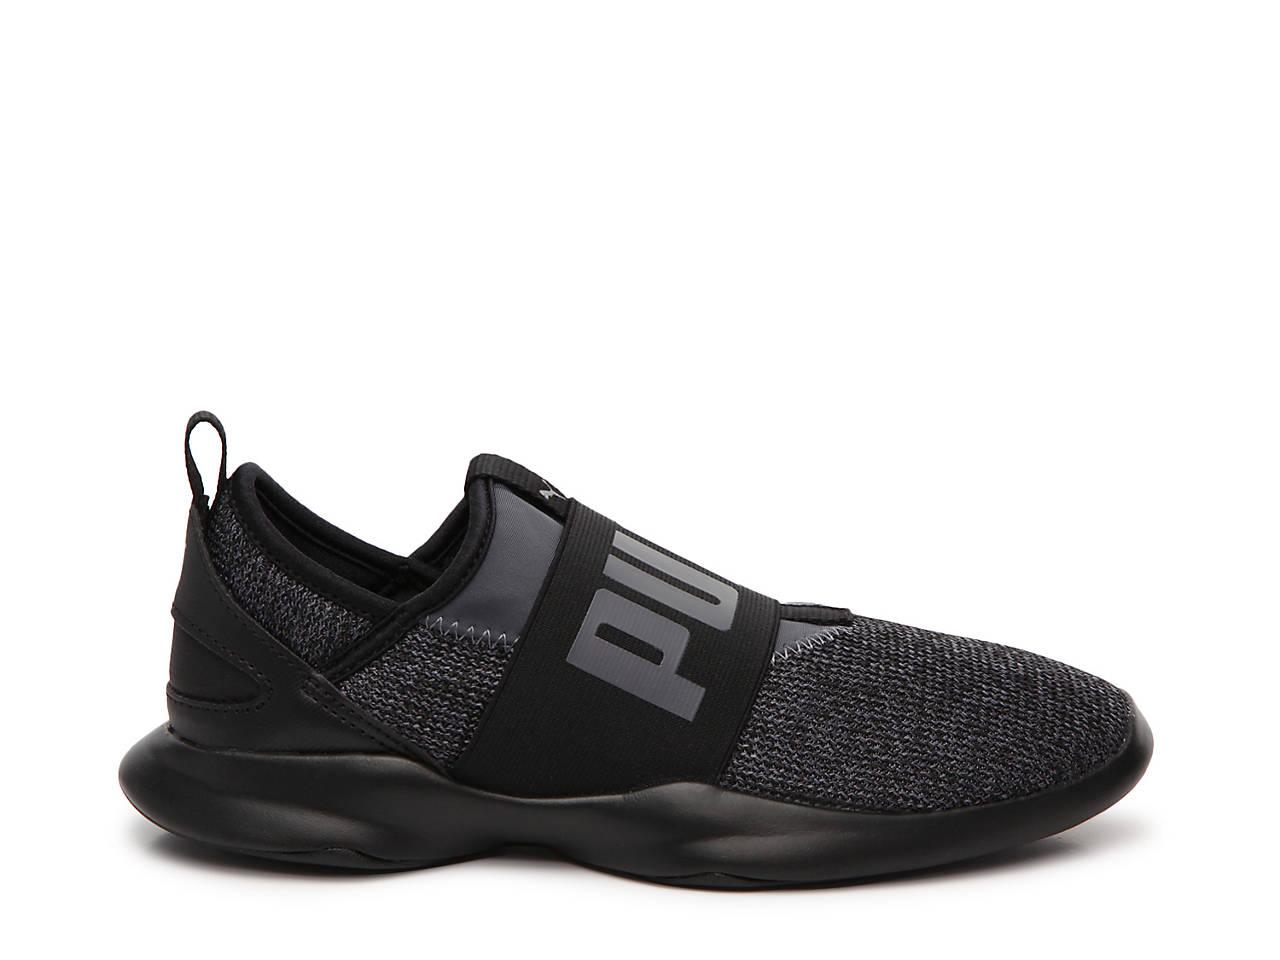 09818f257ad9 Puma Dare Lightweight Slip-On Training Shoe - Women s Women s Shoes ...